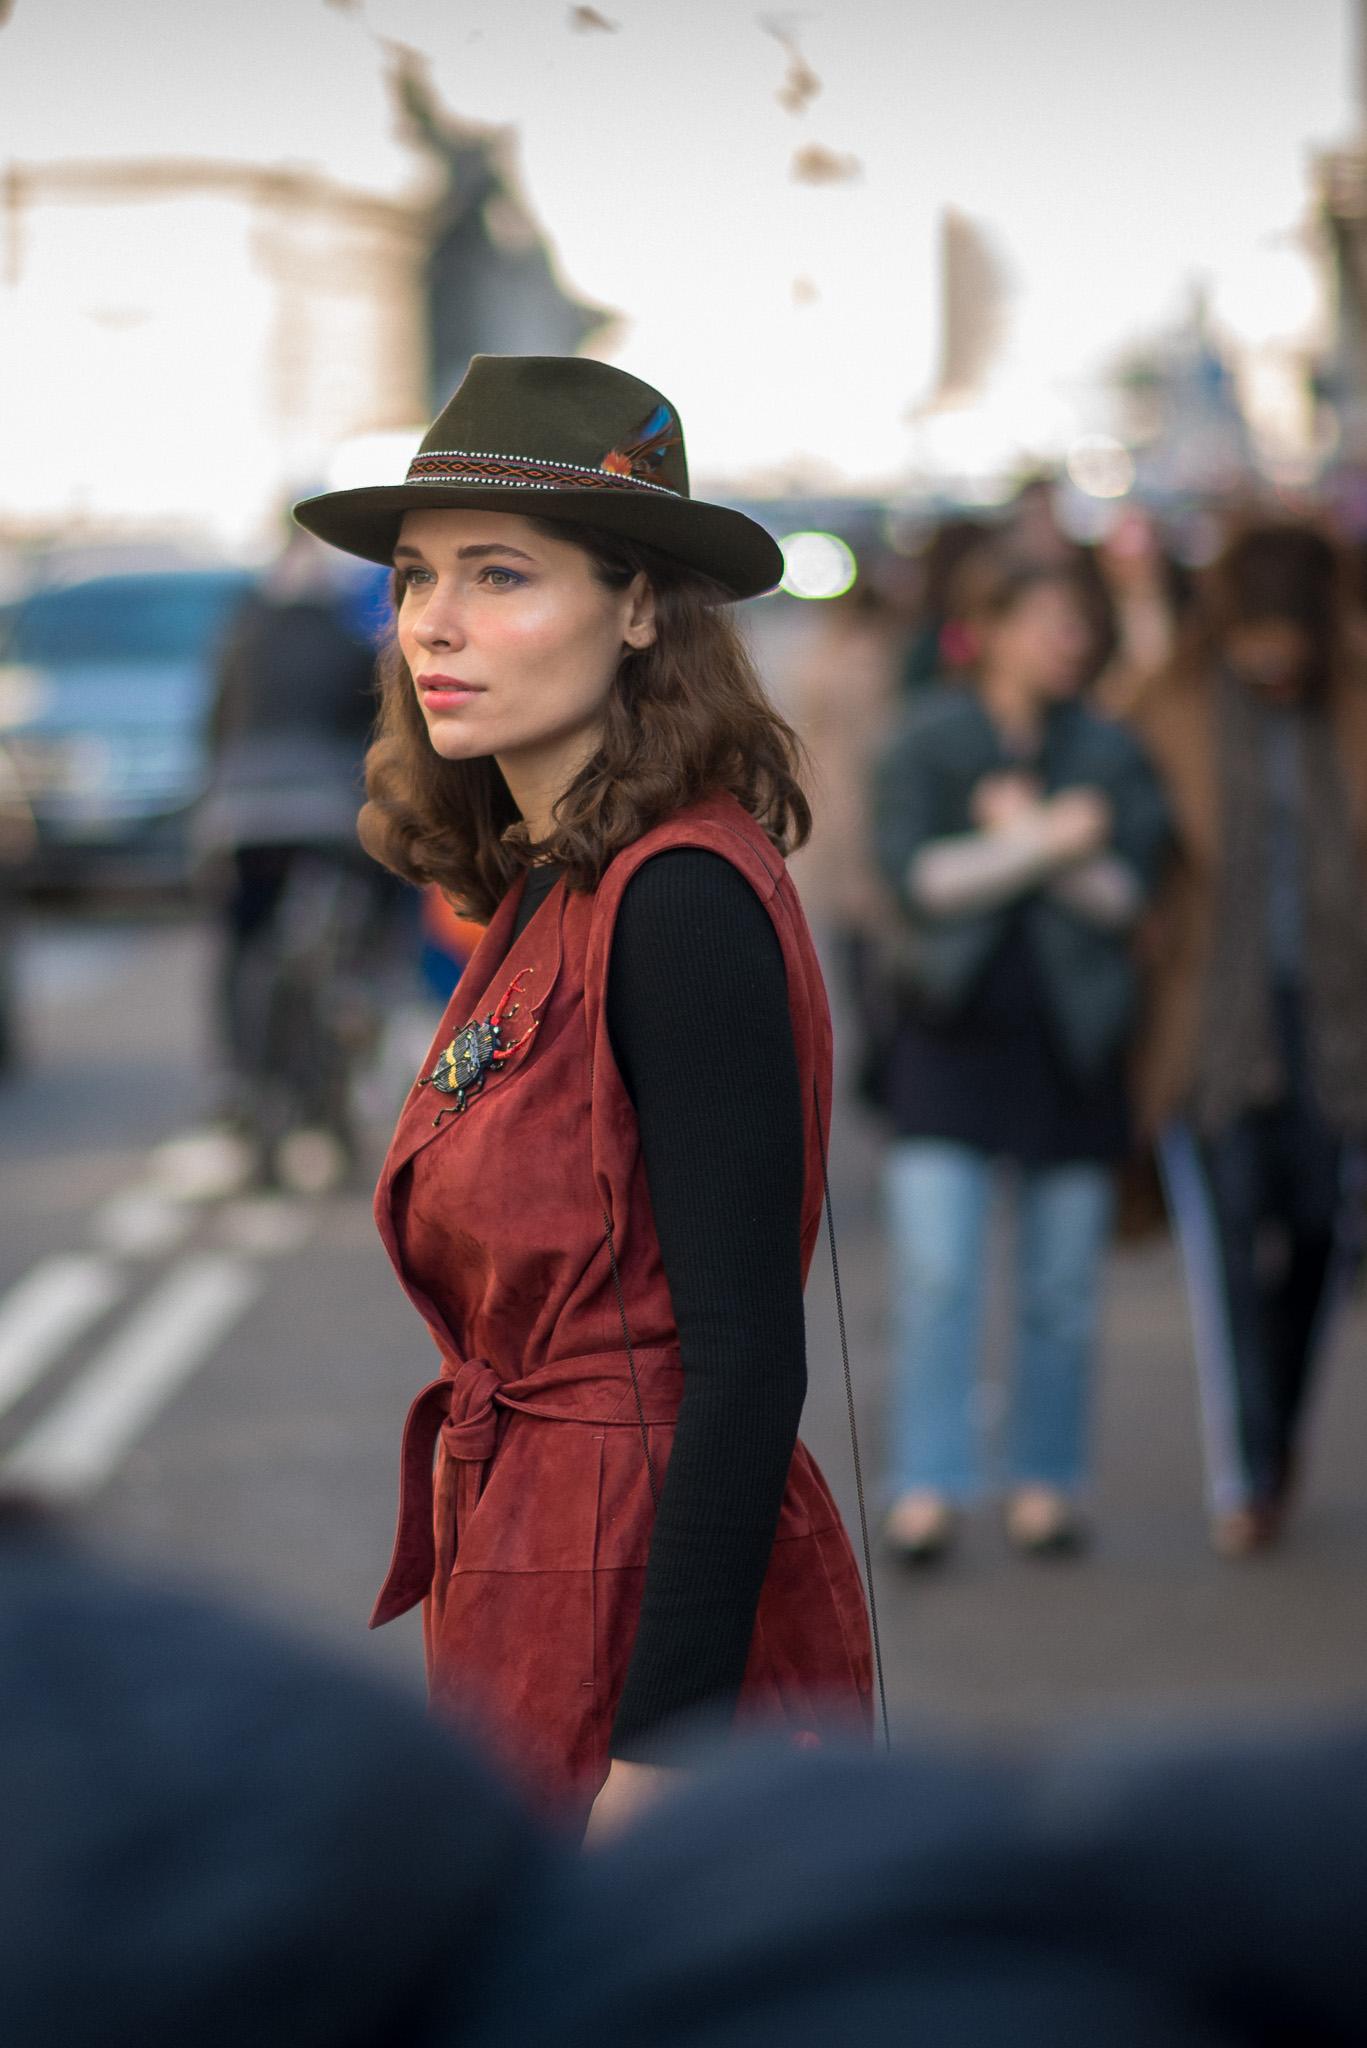 Polina Askeri_Street Style Moments_Trussardi_Milan Fashion Week_February 26th 2017_Photography Annika Lagerqvist_www.annikasomething.com